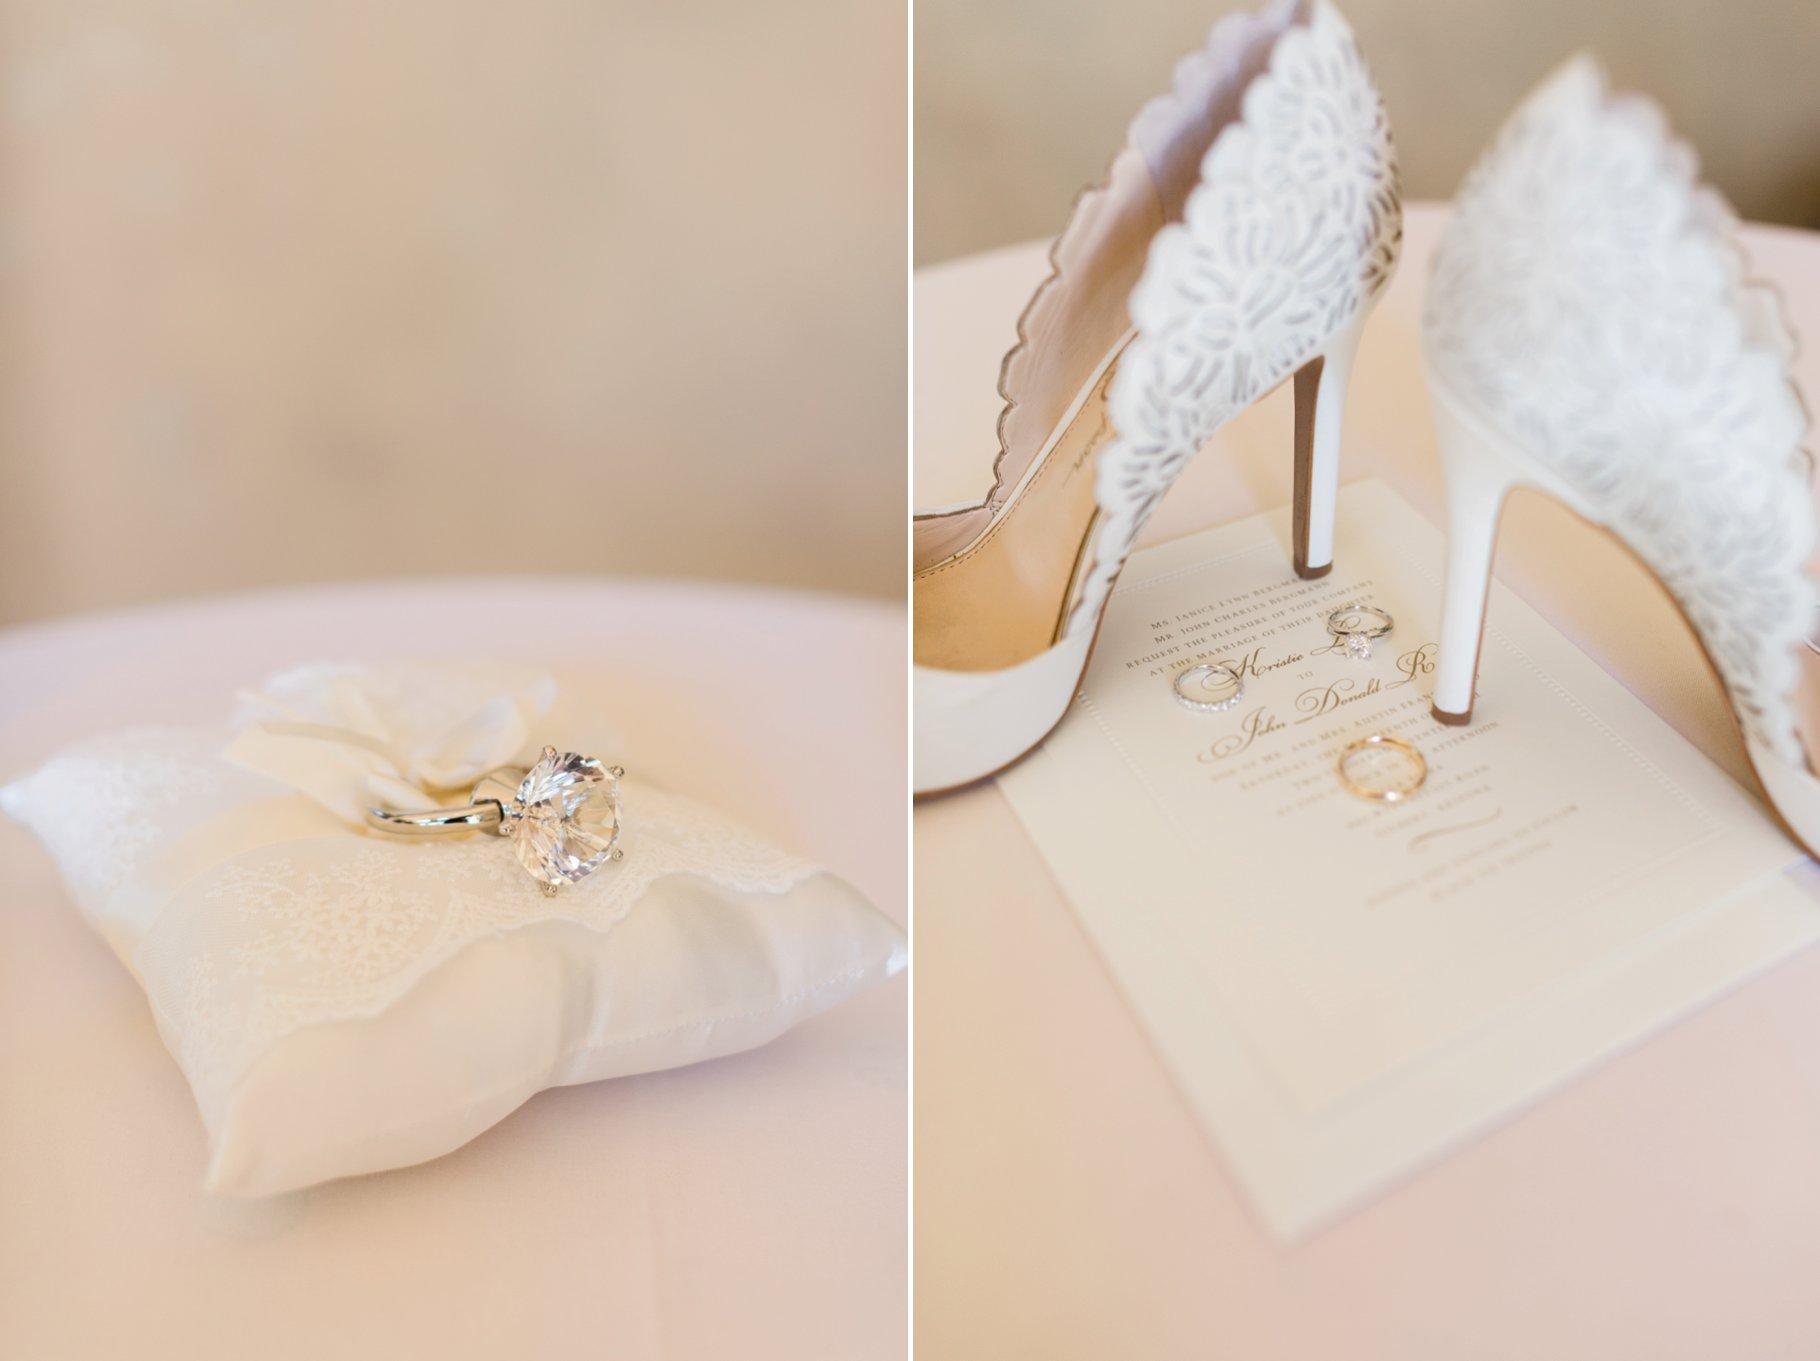 villa siena wedding-003_GRETCHEN WAKEMAN PHOTOGRAPHY.jpg